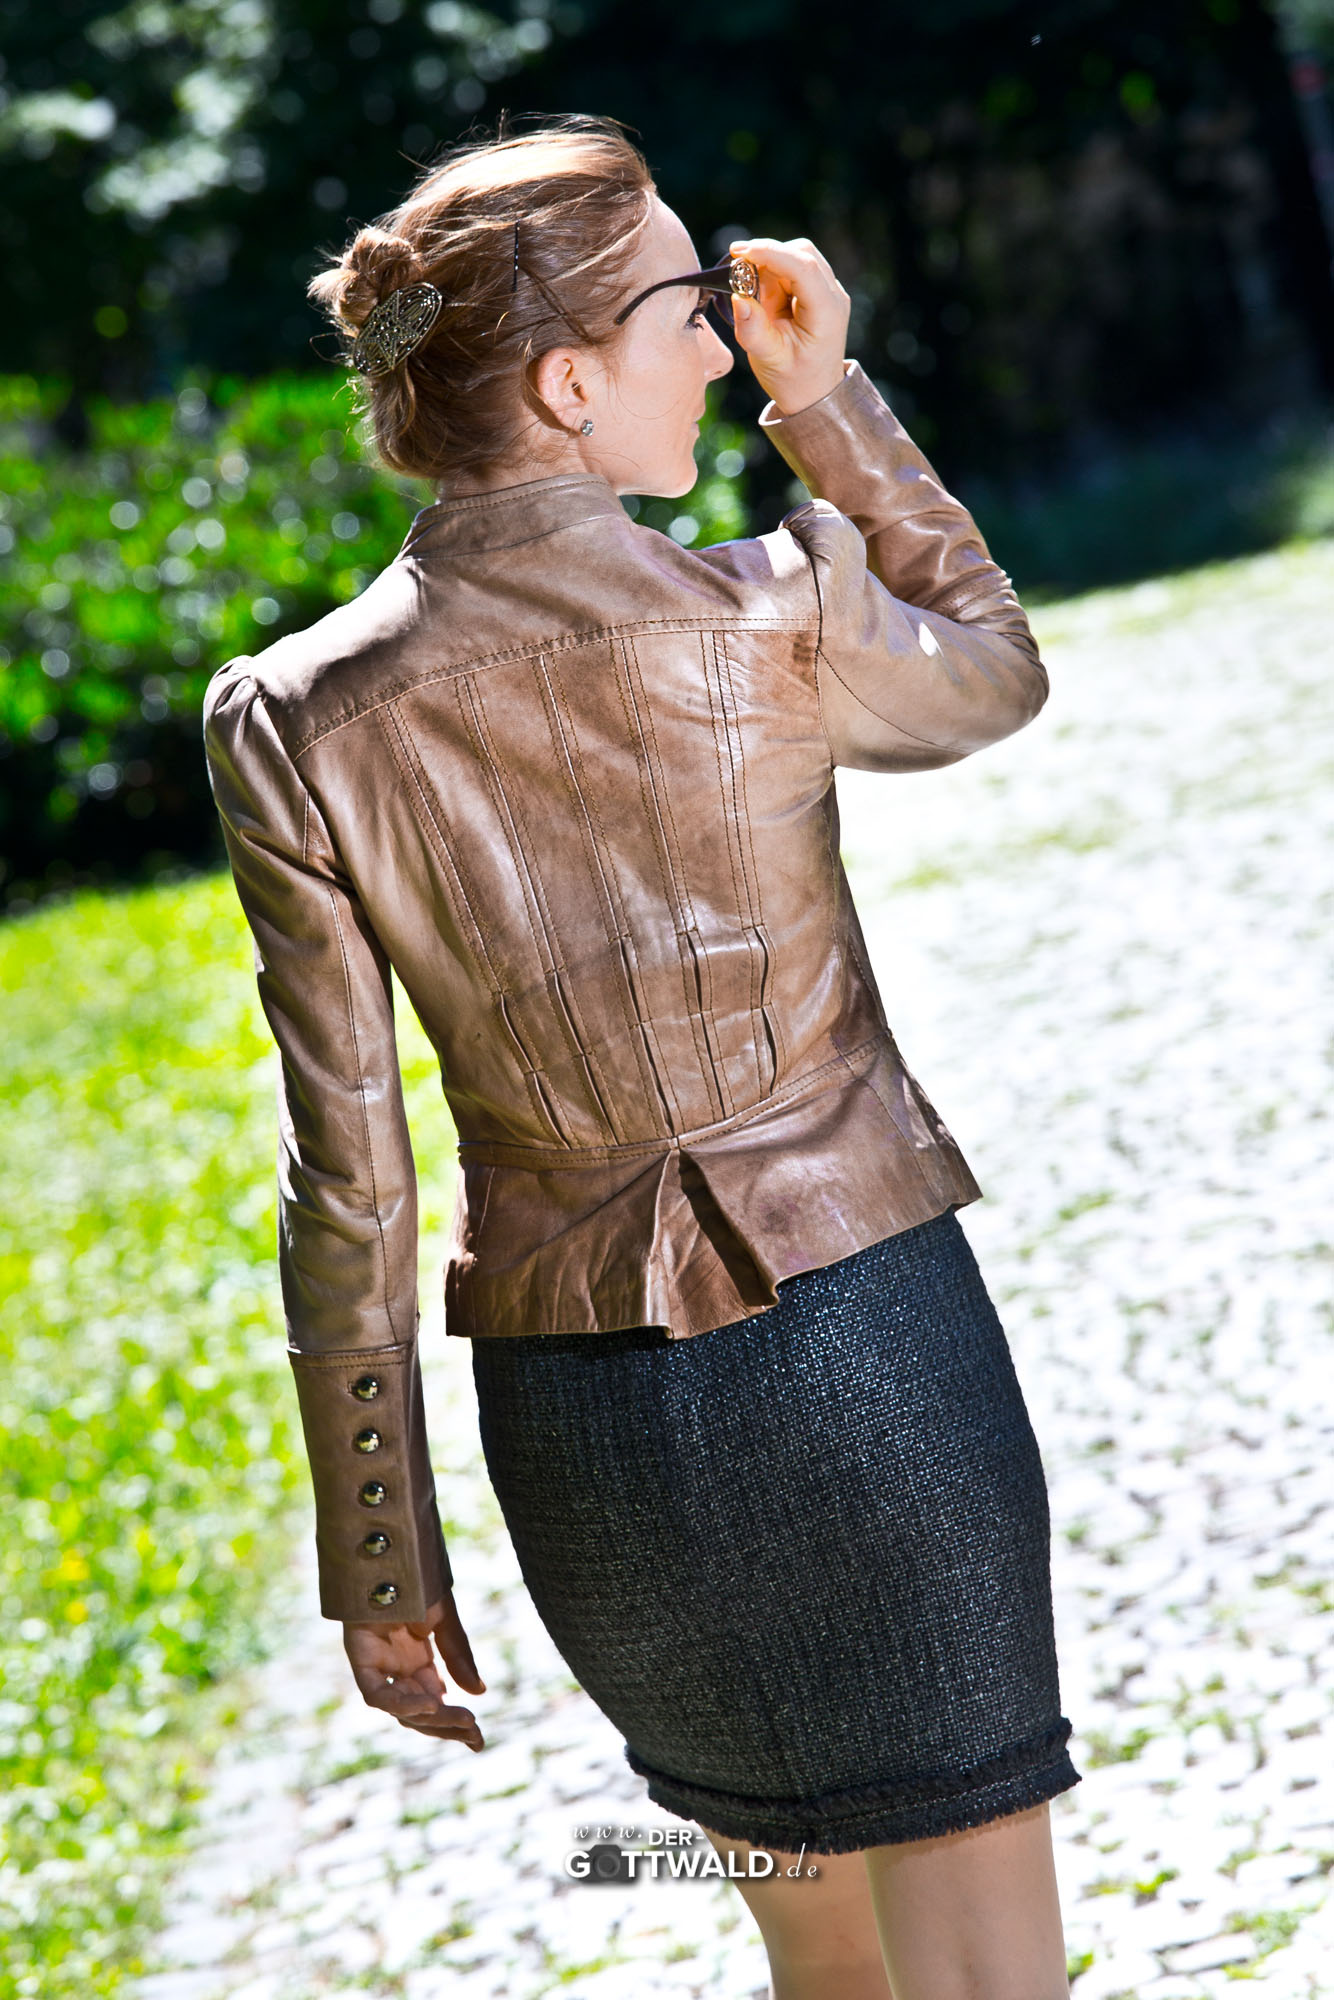 der-gottwaldDE - Fashion 12.jpg